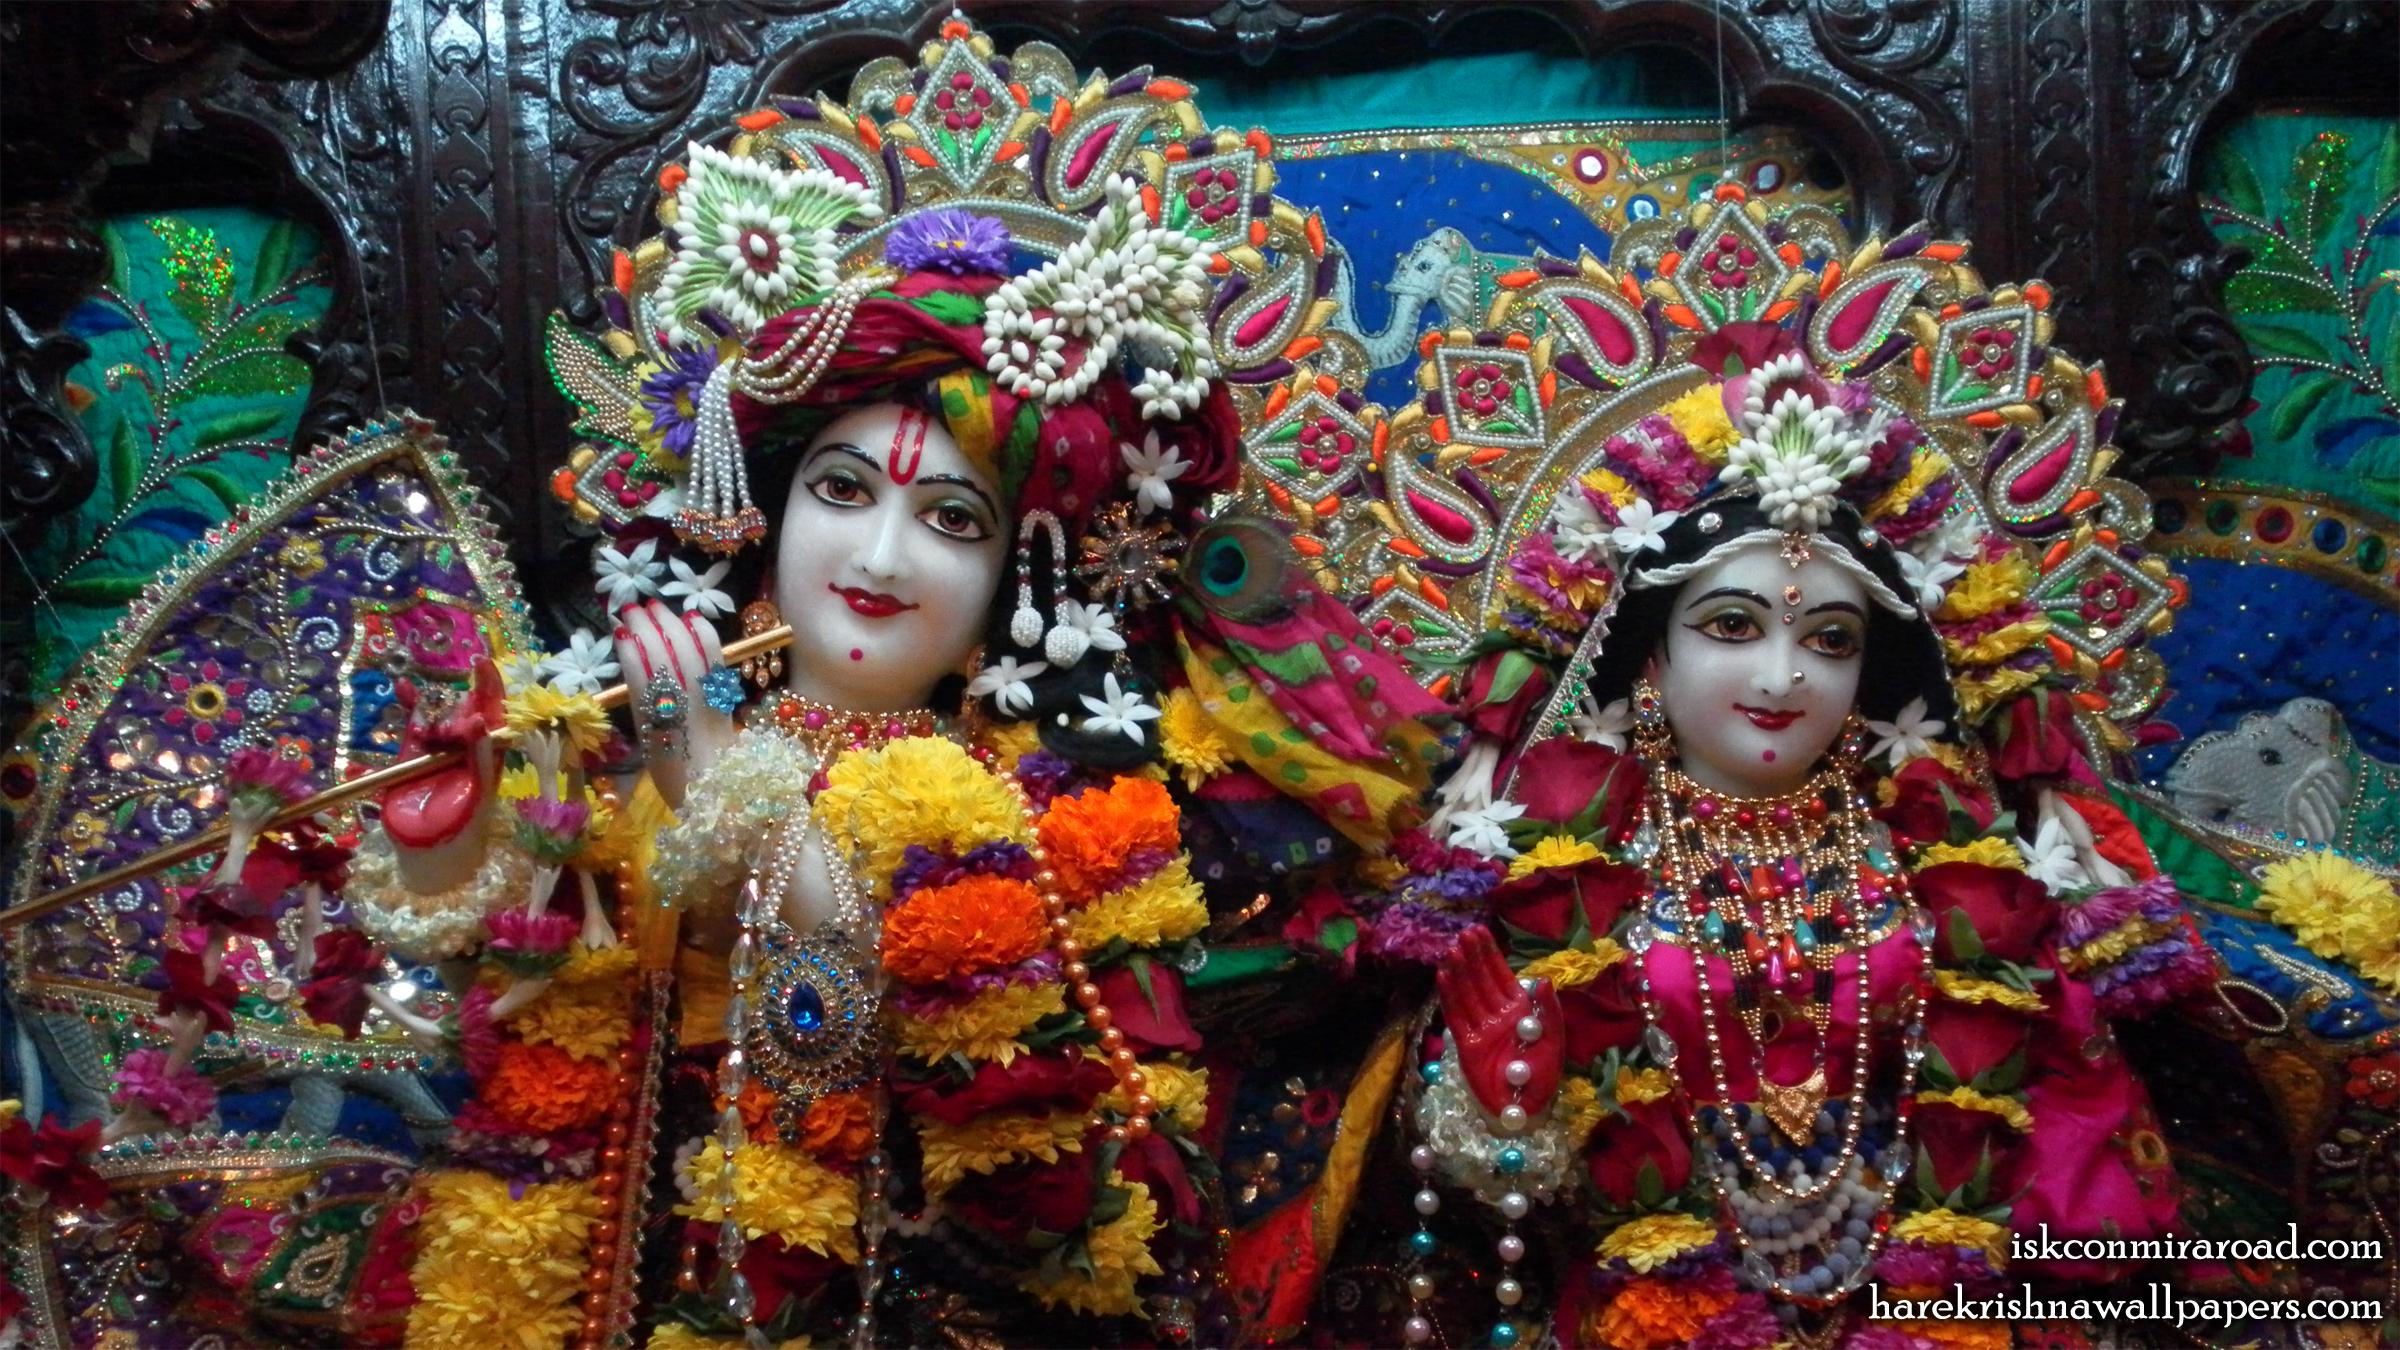 Sri Sri Radha Giridhari Close up Wallpaper (025) Size 2400x1350 Download